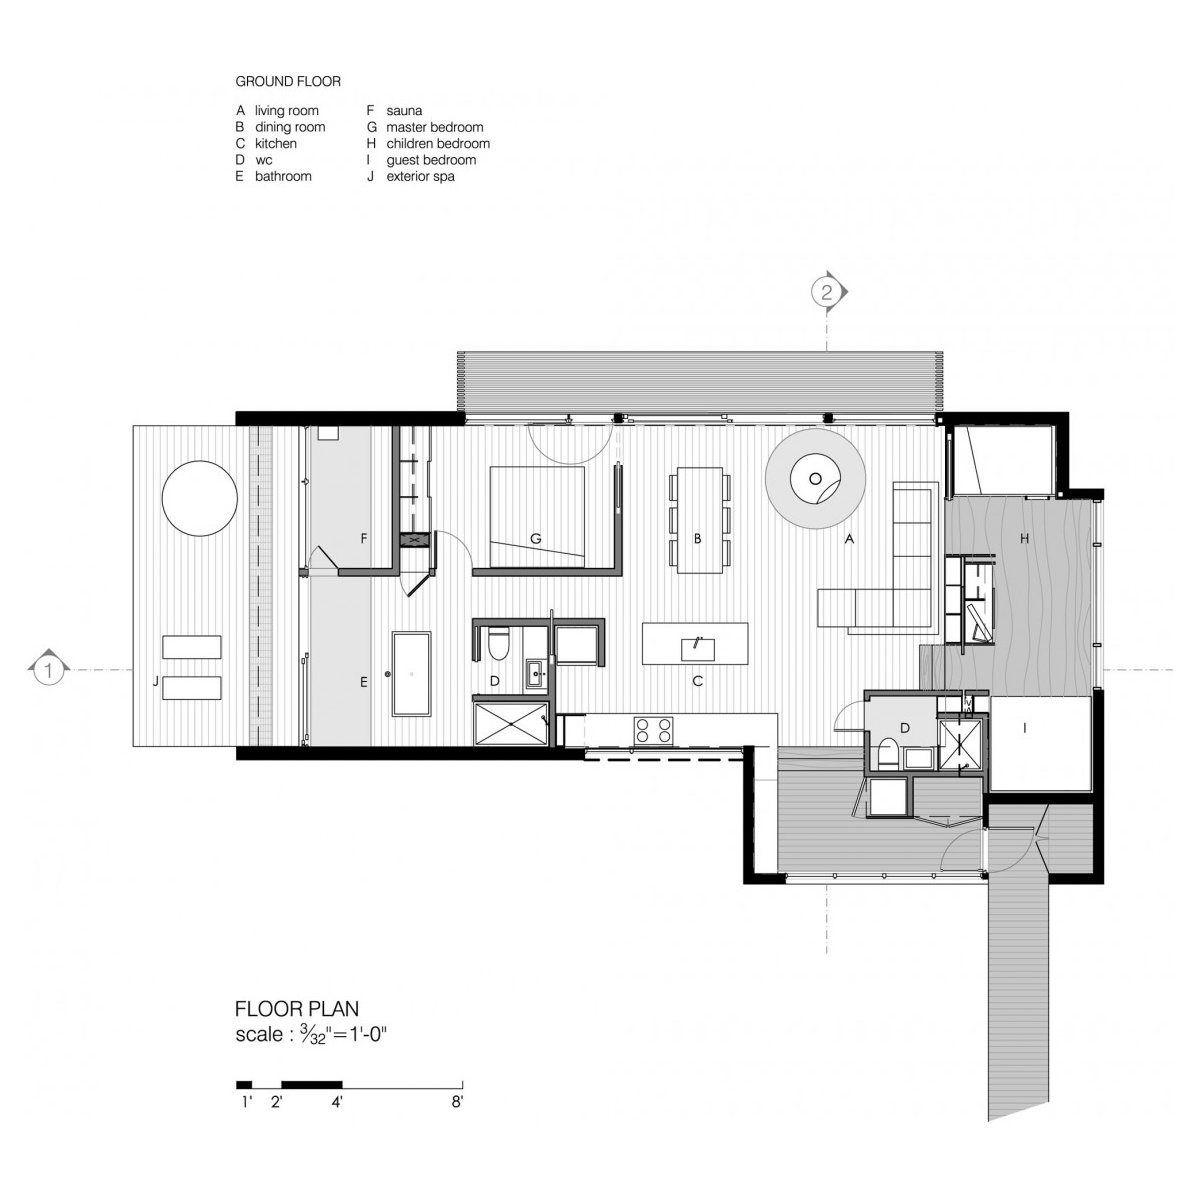 floor plan of la luge a modern ski cabin by yiacouvakis hamelin